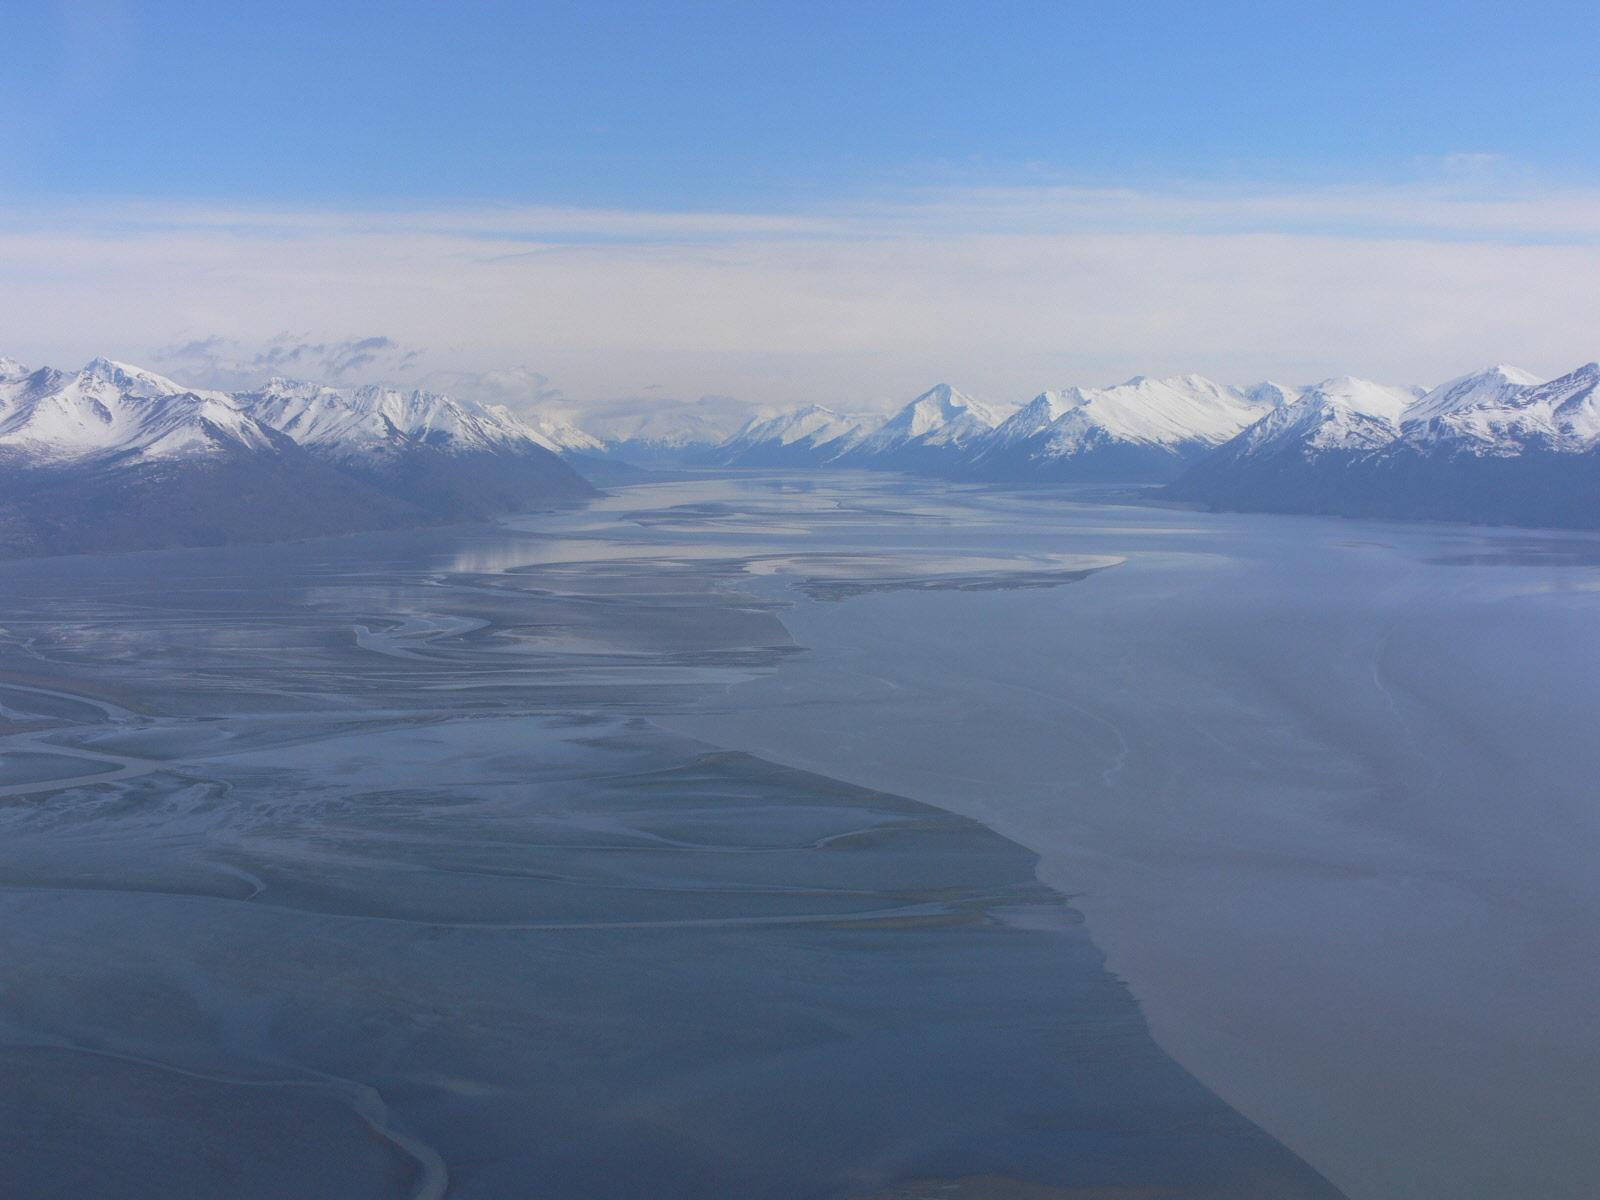 Anchorage To Valdez May 2006